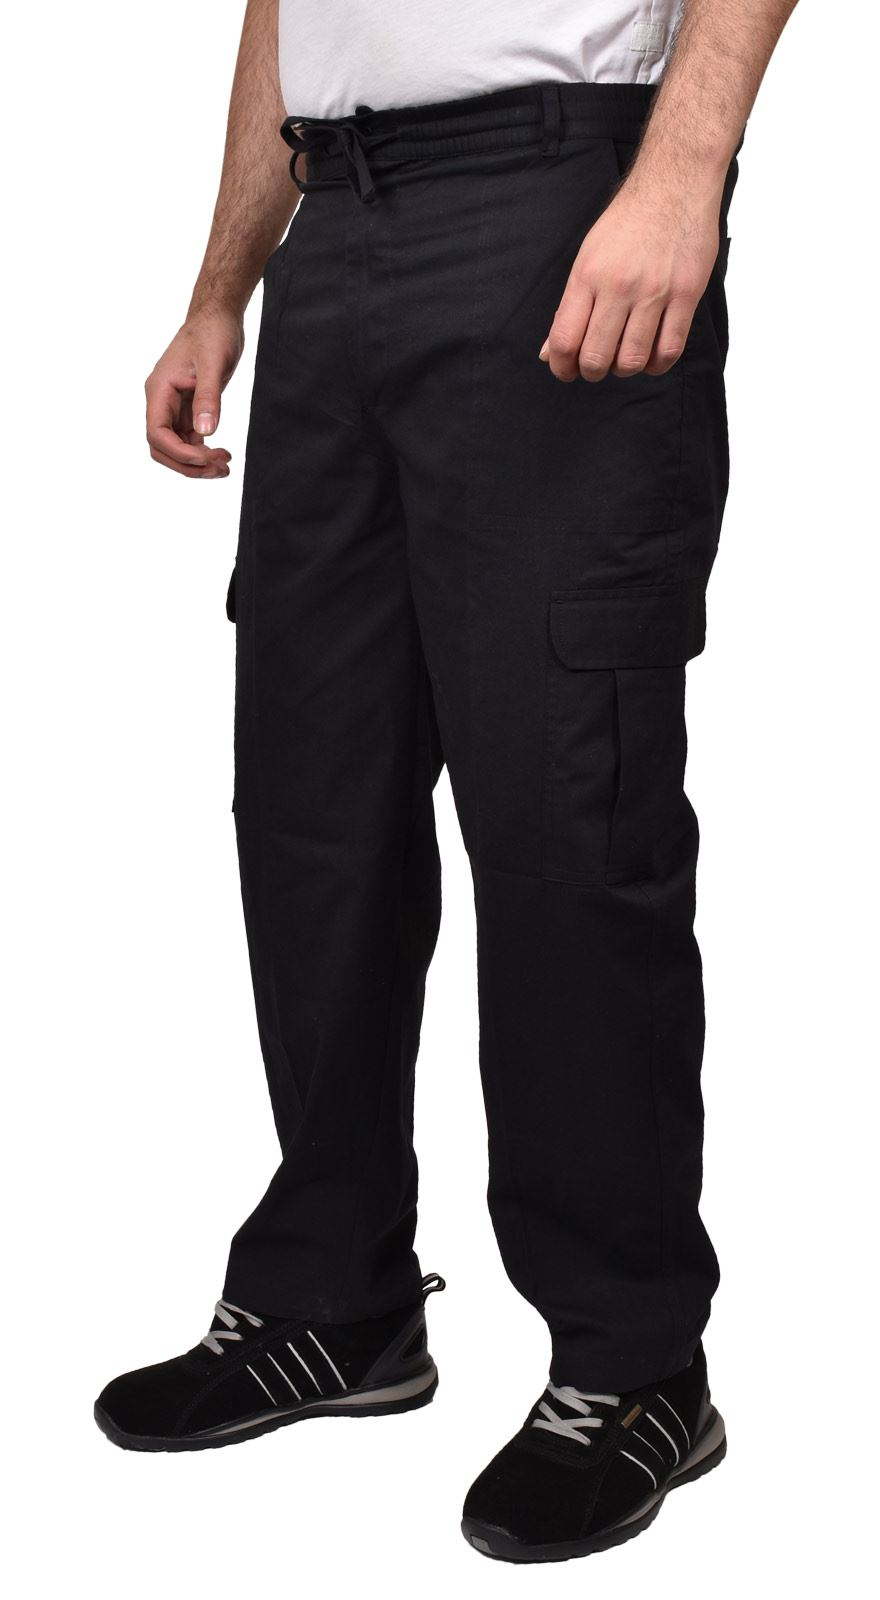 Para-Hombre-De-Carga-Combate-Pantalones-De-Trabajo-Bolsillos-Patrulla-Tactico-Pro-Algodon-Pantalones miniatura 3